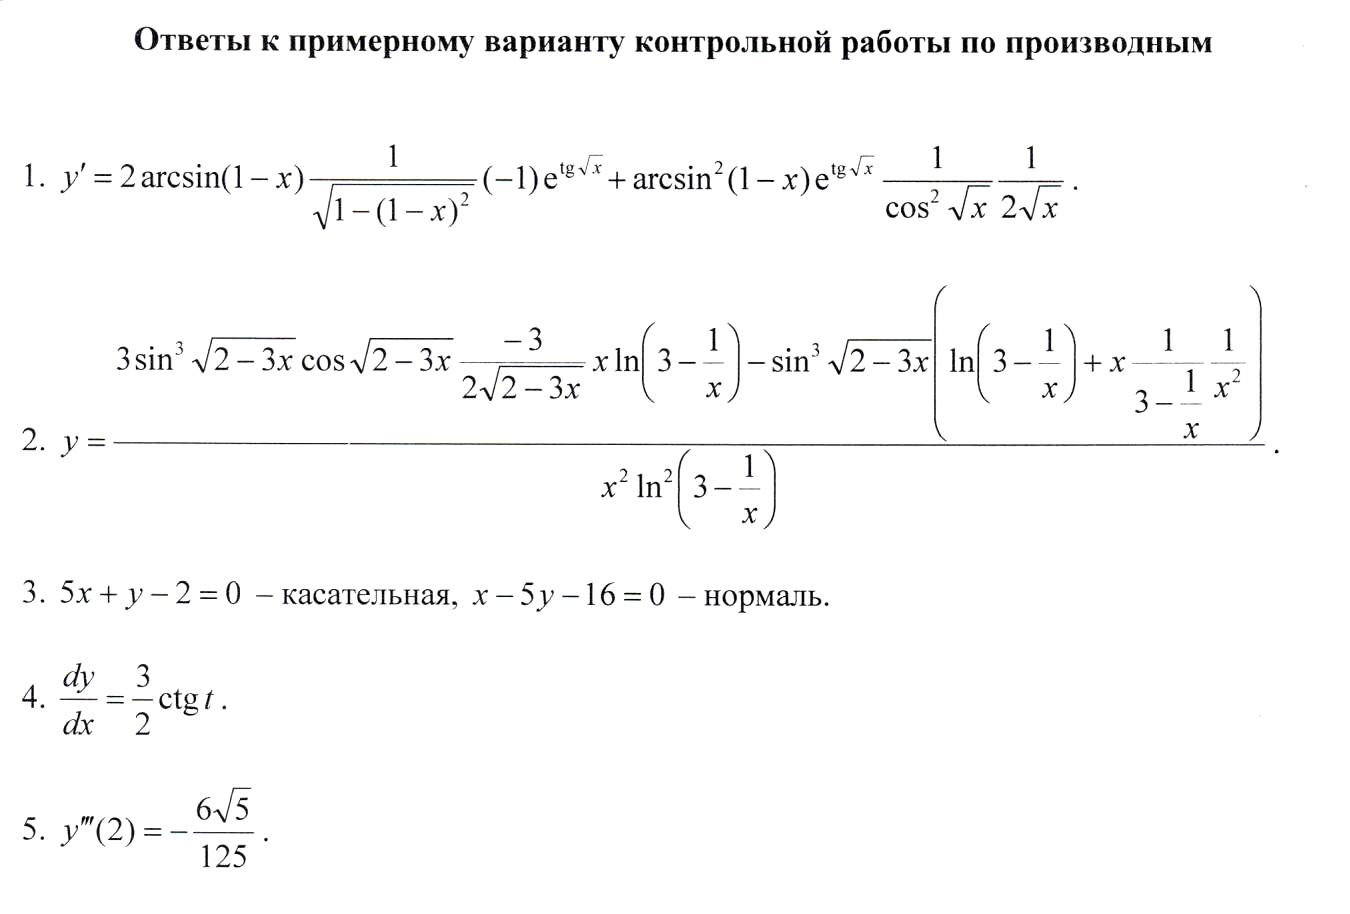 ma alexander osetrov ответы pdf file или